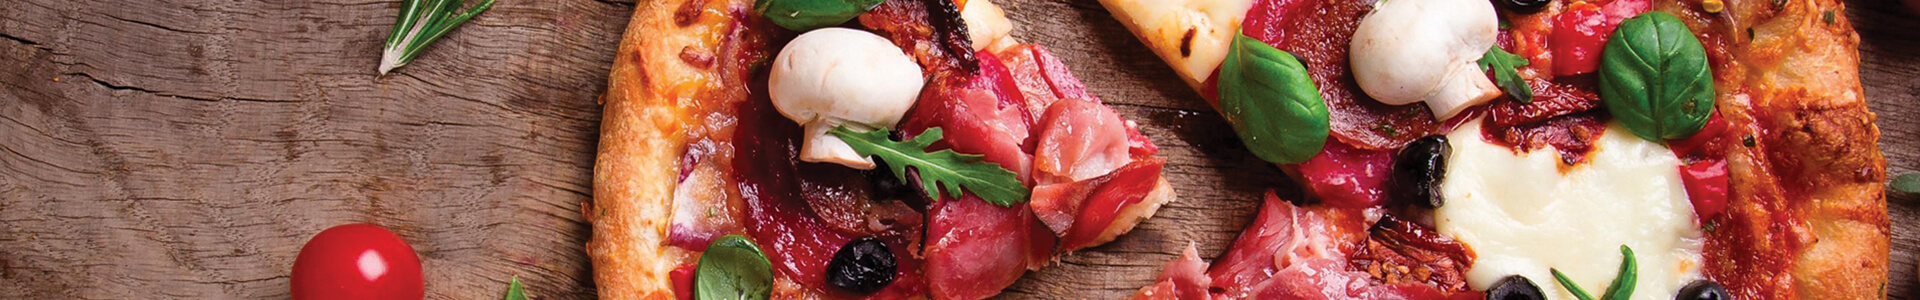 pizza - eviadelivery.gr